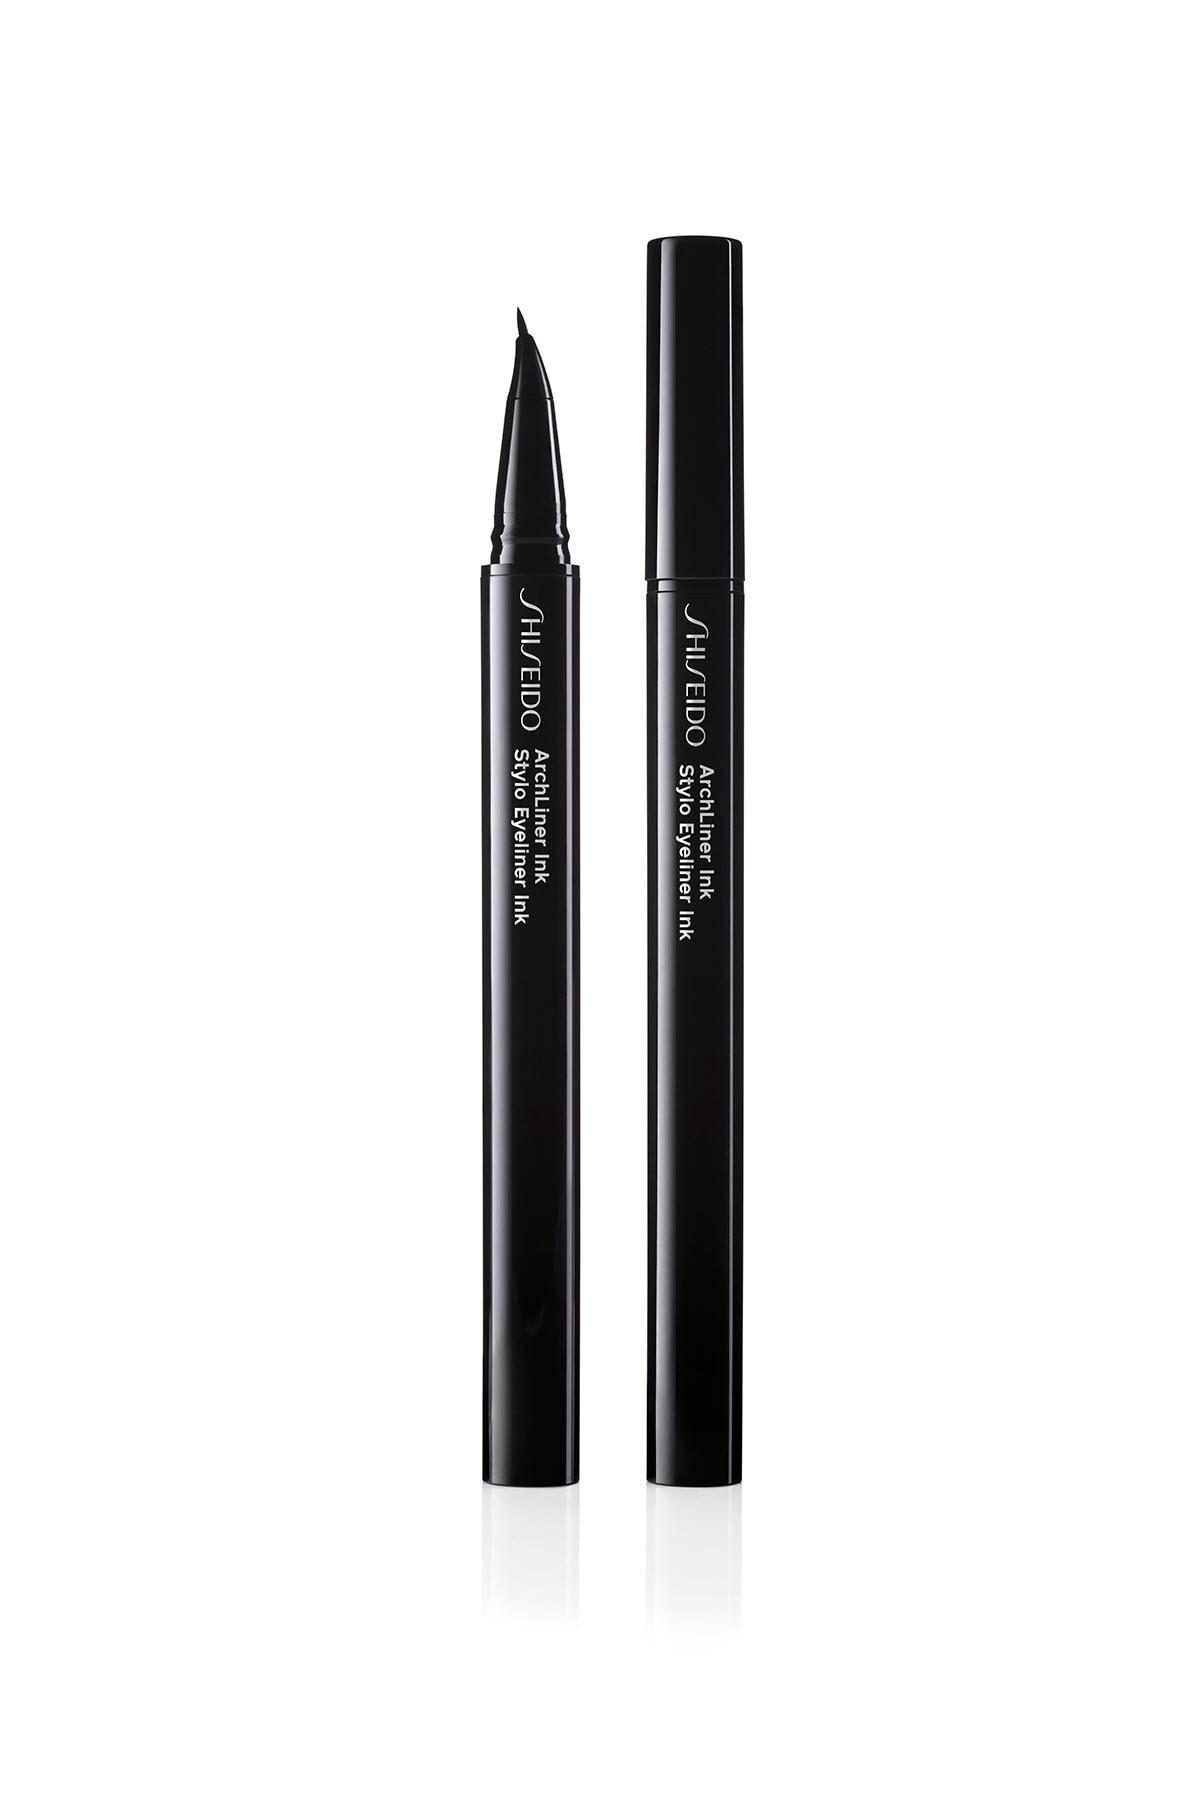 Shiseido İnce ve Kıvrık Uçlu Likit Eyeliner - Archliner Ink 01 729238147324